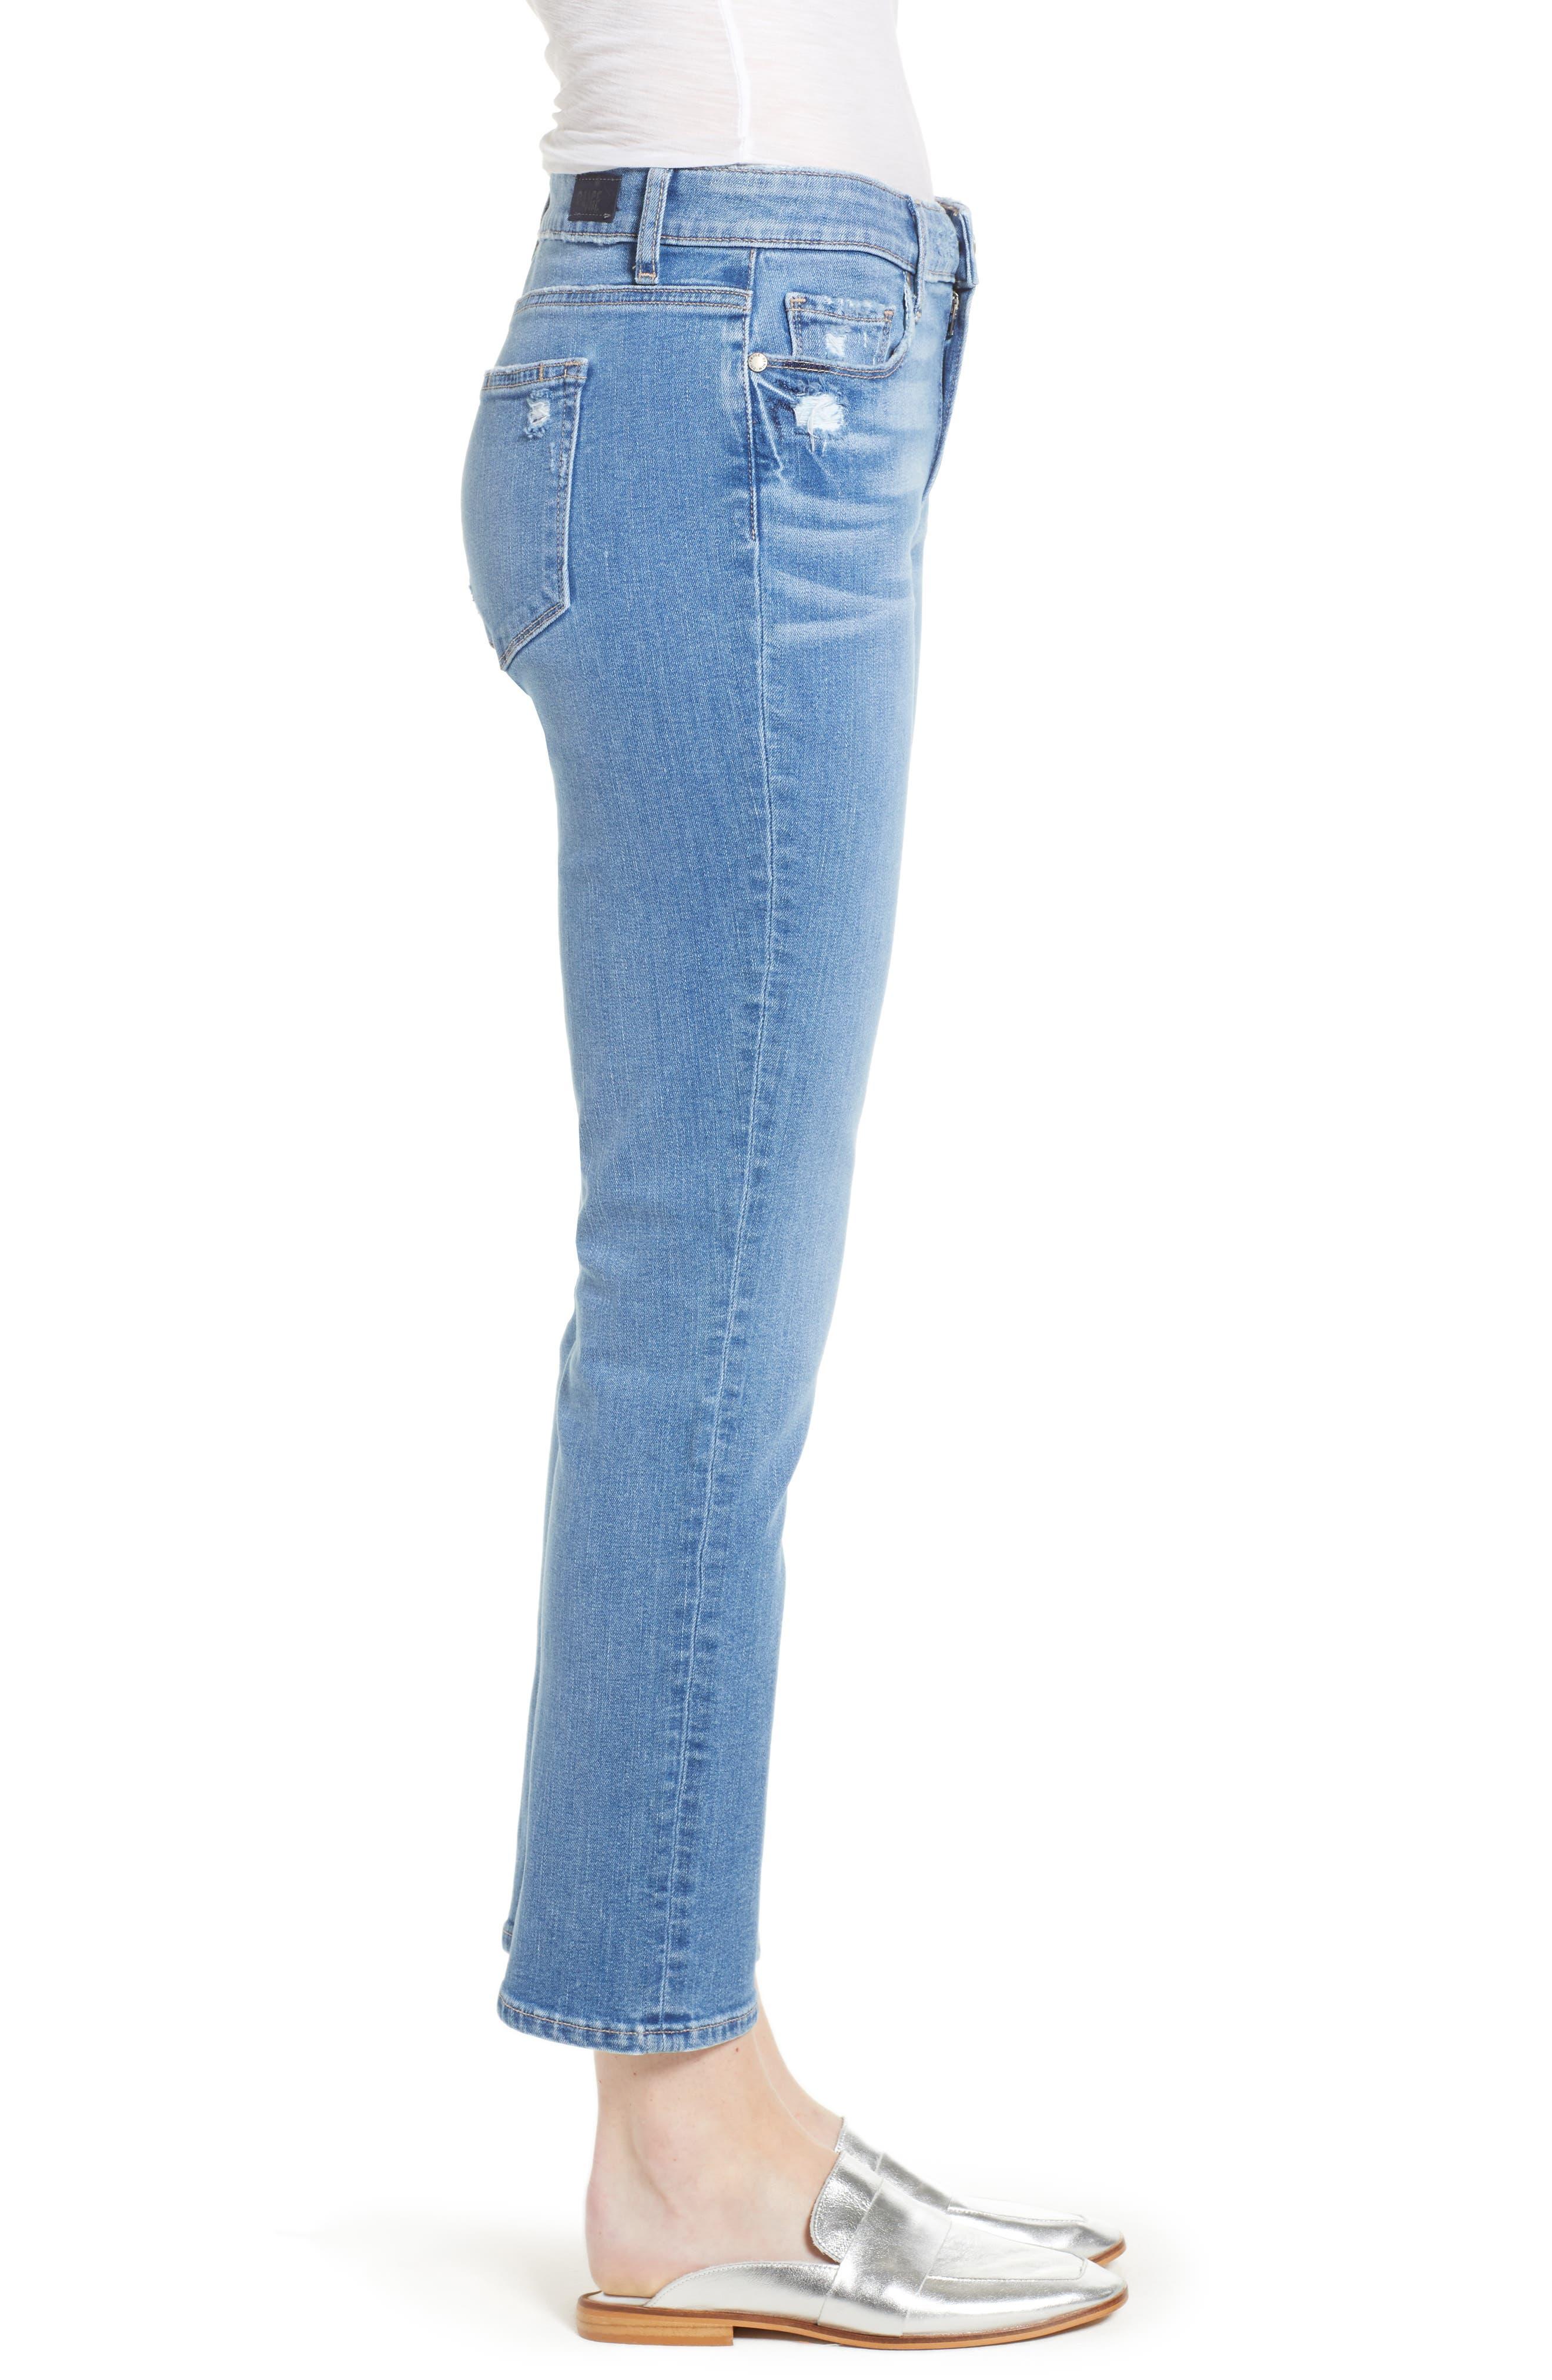 Transcend Vintage - Jimmy Jimmy High Waist Crop Boyfriend Jeans,                             Alternate thumbnail 3, color,                             VINTAGE VENICE